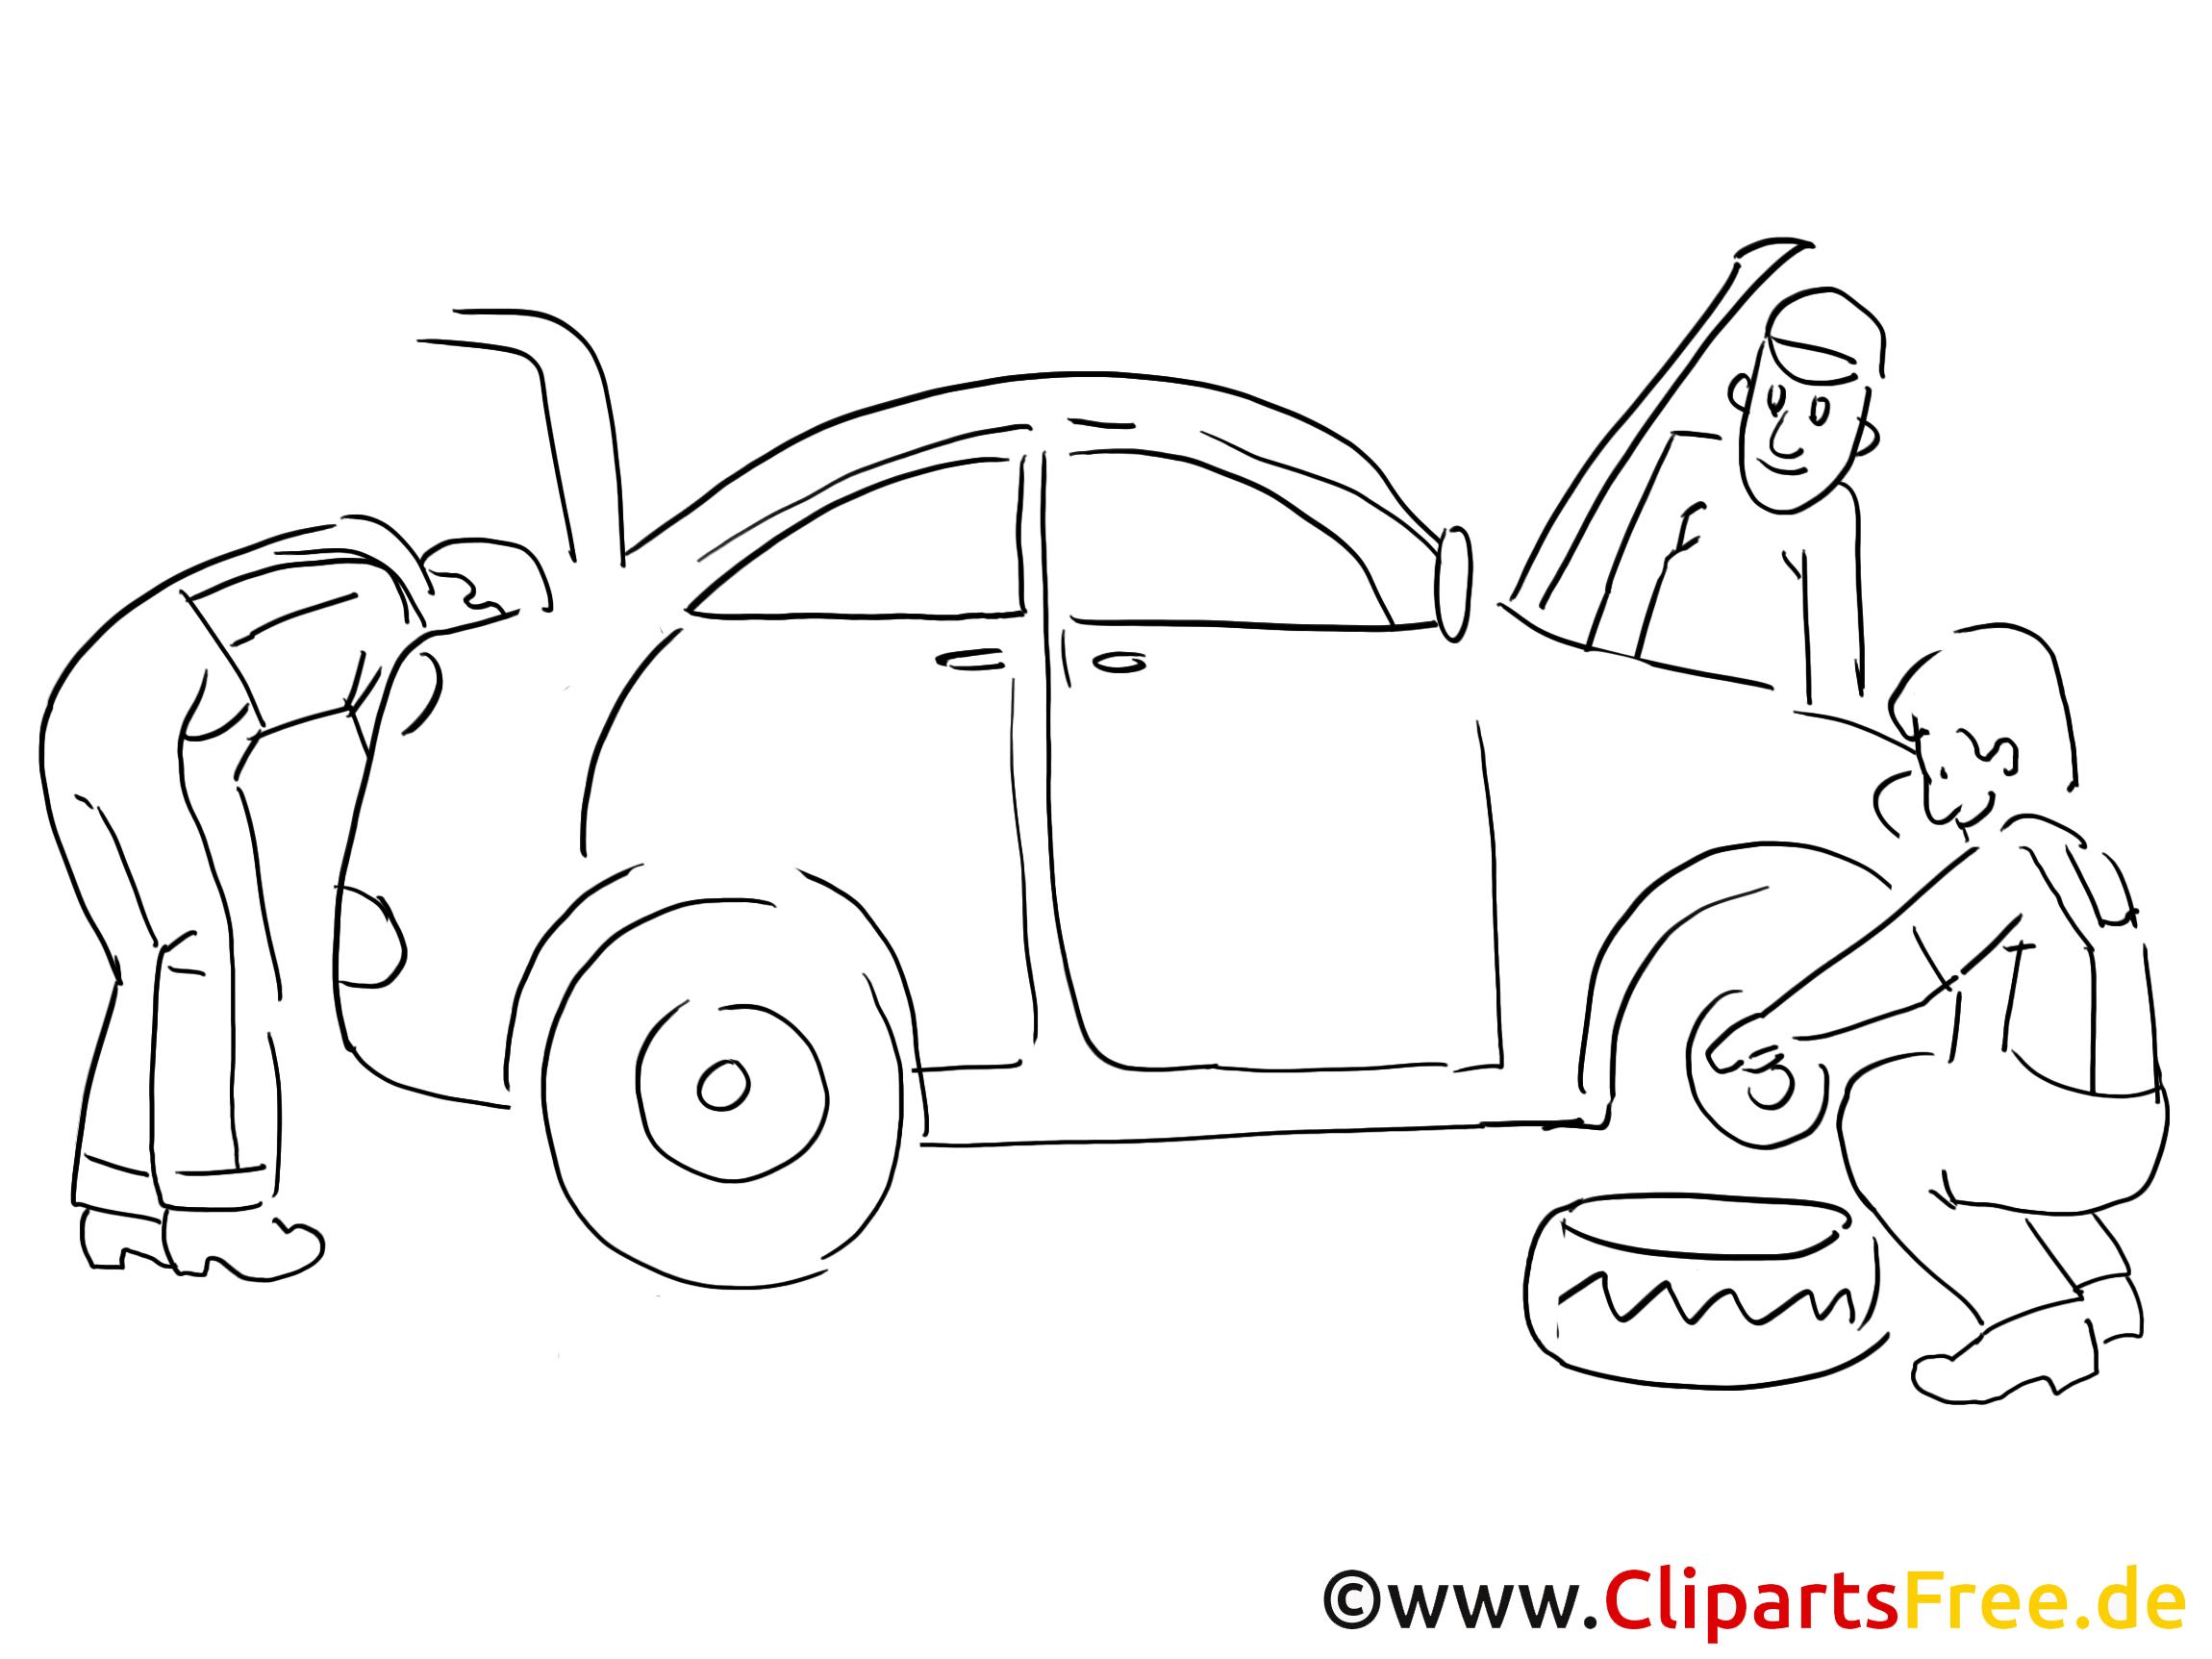 Automobile repair shop clip art black and white, graphic, pic